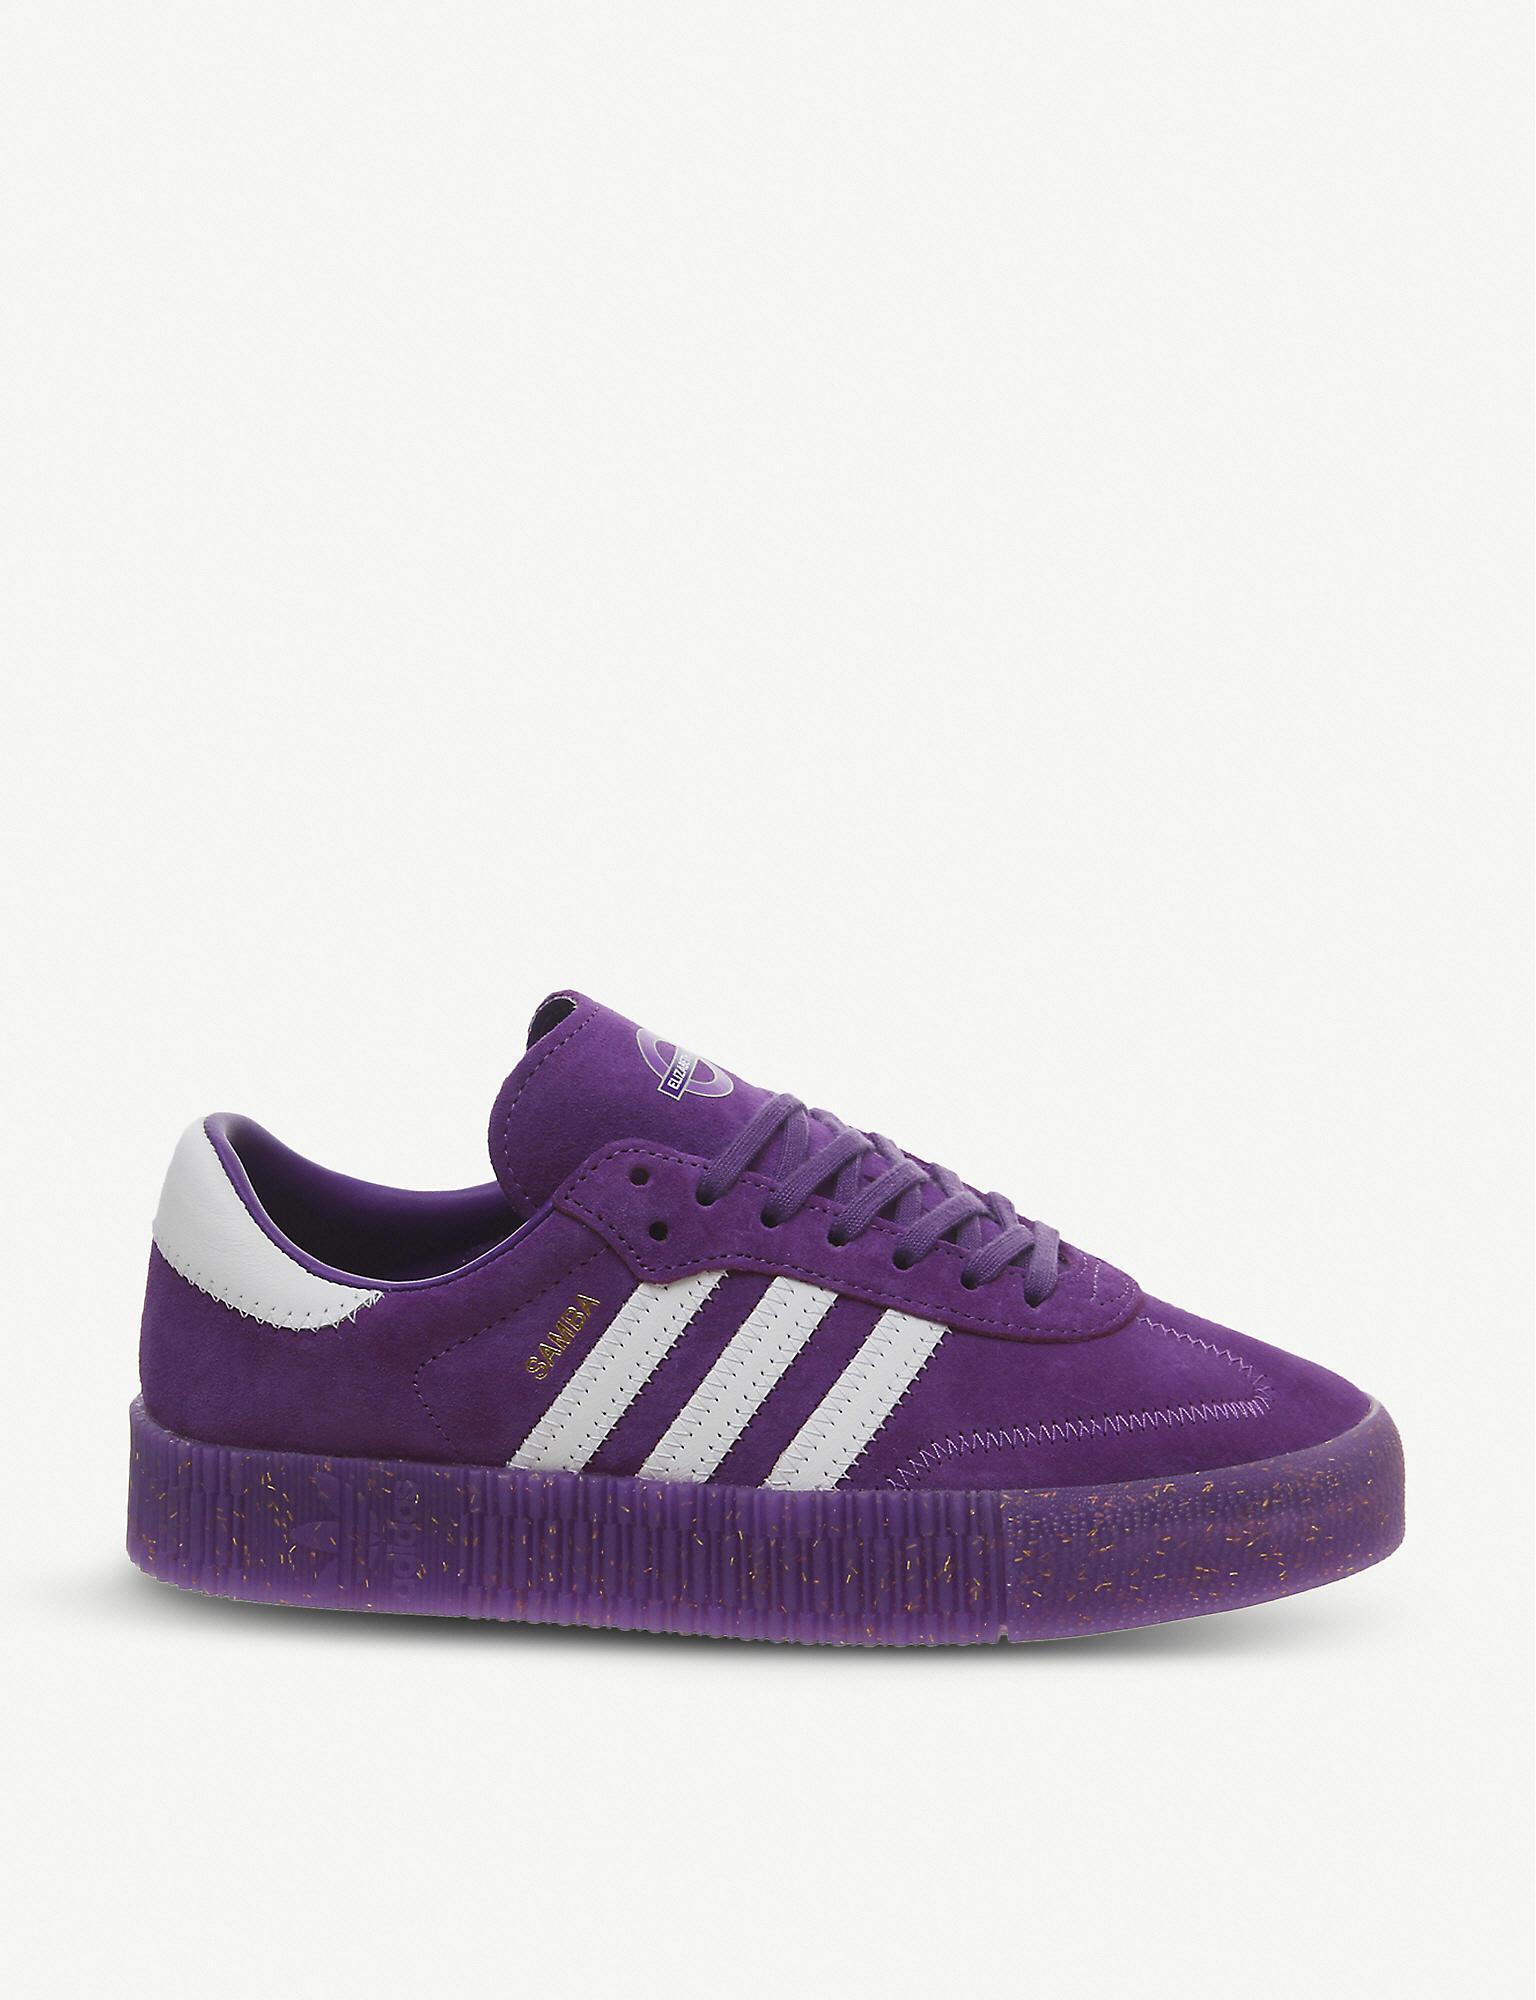 Cheap \u003e adidas samba purple suede \u003e OFF